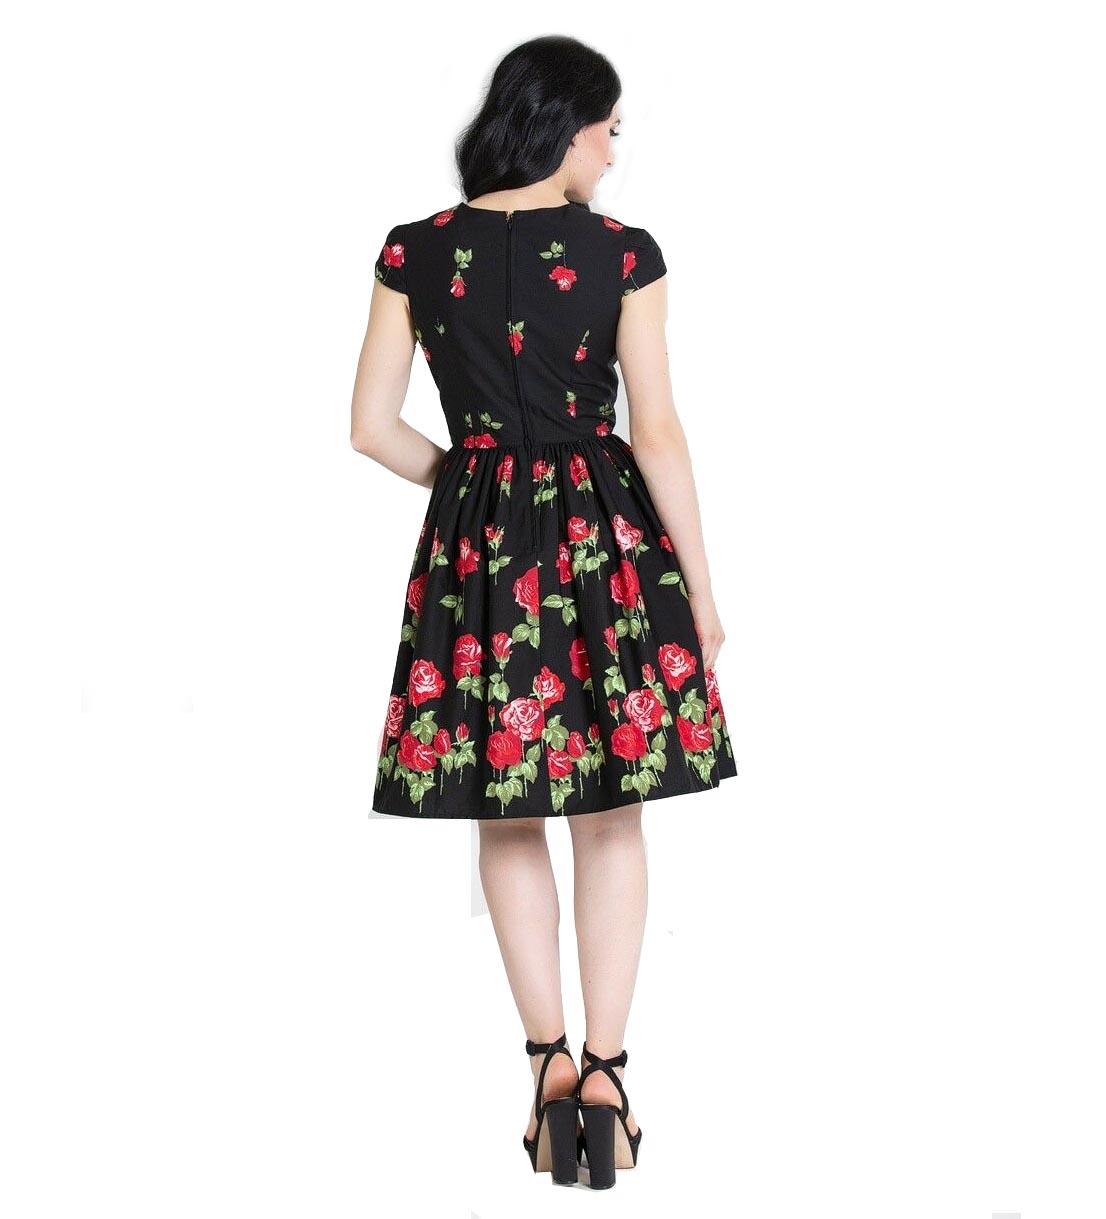 Hell-Bunny-Pin-Up-Mid-Length-50s-Dress-ANTONIA-Rose-Floral-Black thumbnail 21